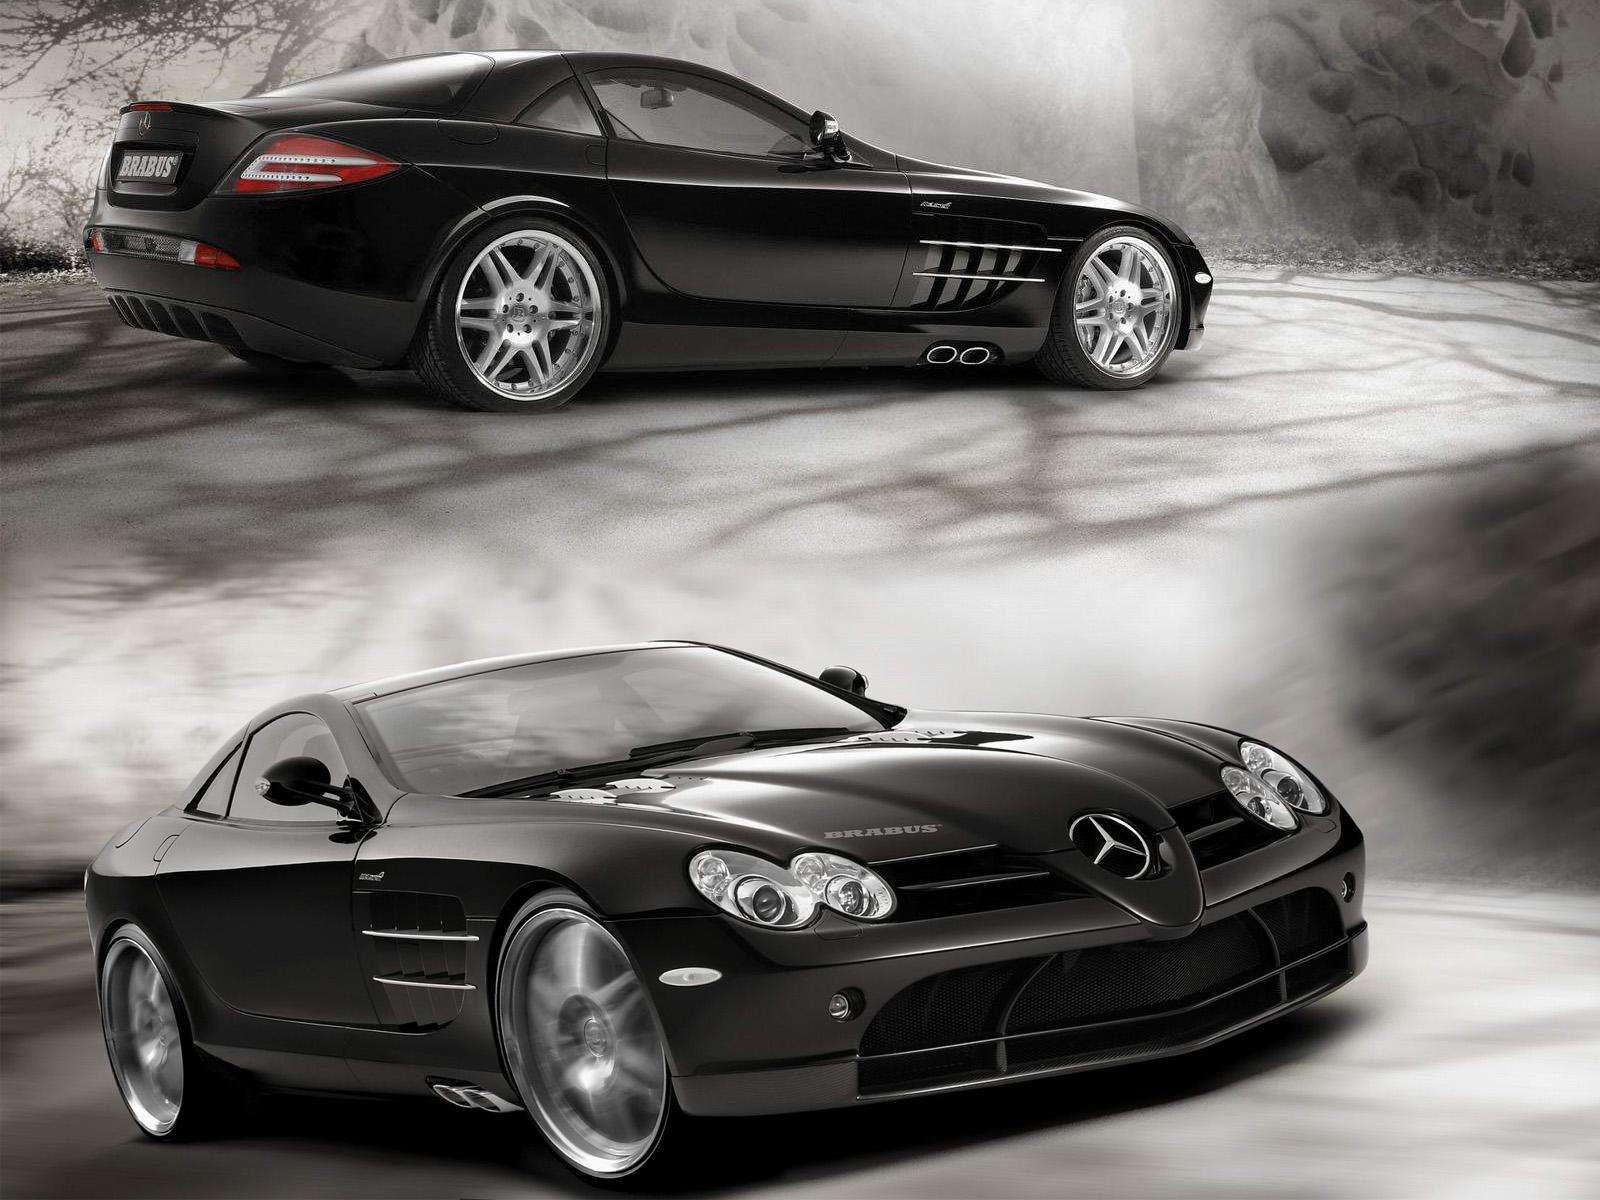 http://4.bp.blogspot.com/-jvGgiSwb0h4/UKMkaAJgqJI/AAAAAAAAHK4/BqF7VZ8G7vg/s1600/Brabus_Mercedes_Benz_SLR_2005.jpg